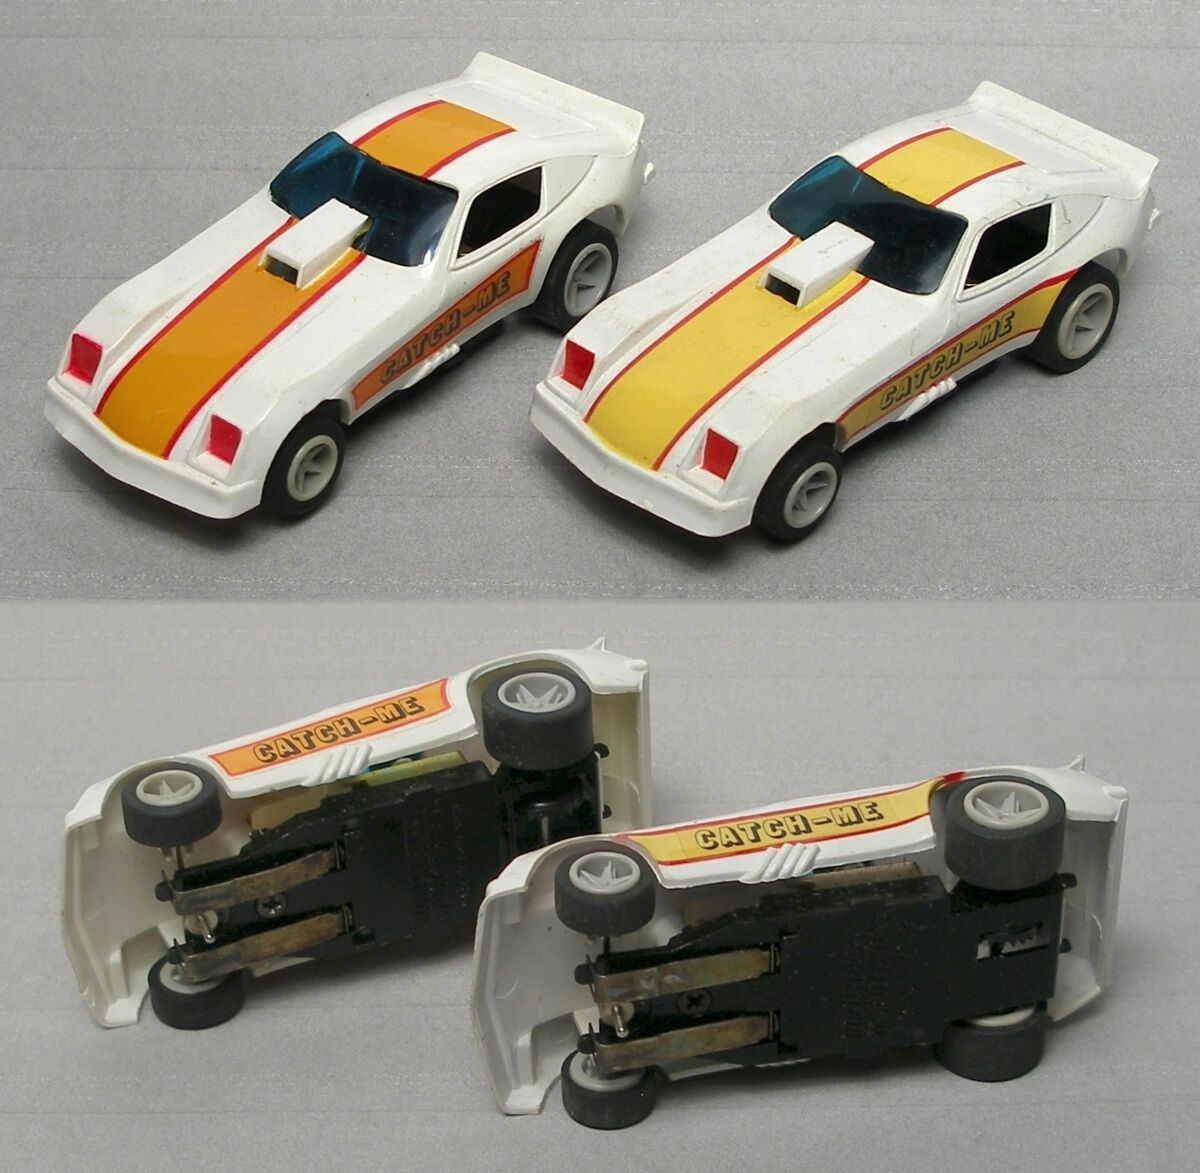 2 matchbox 1979 Attrape-Master Edition Monza Drôle Voiture ho slot car 12 V variations 3742 Inutilisé